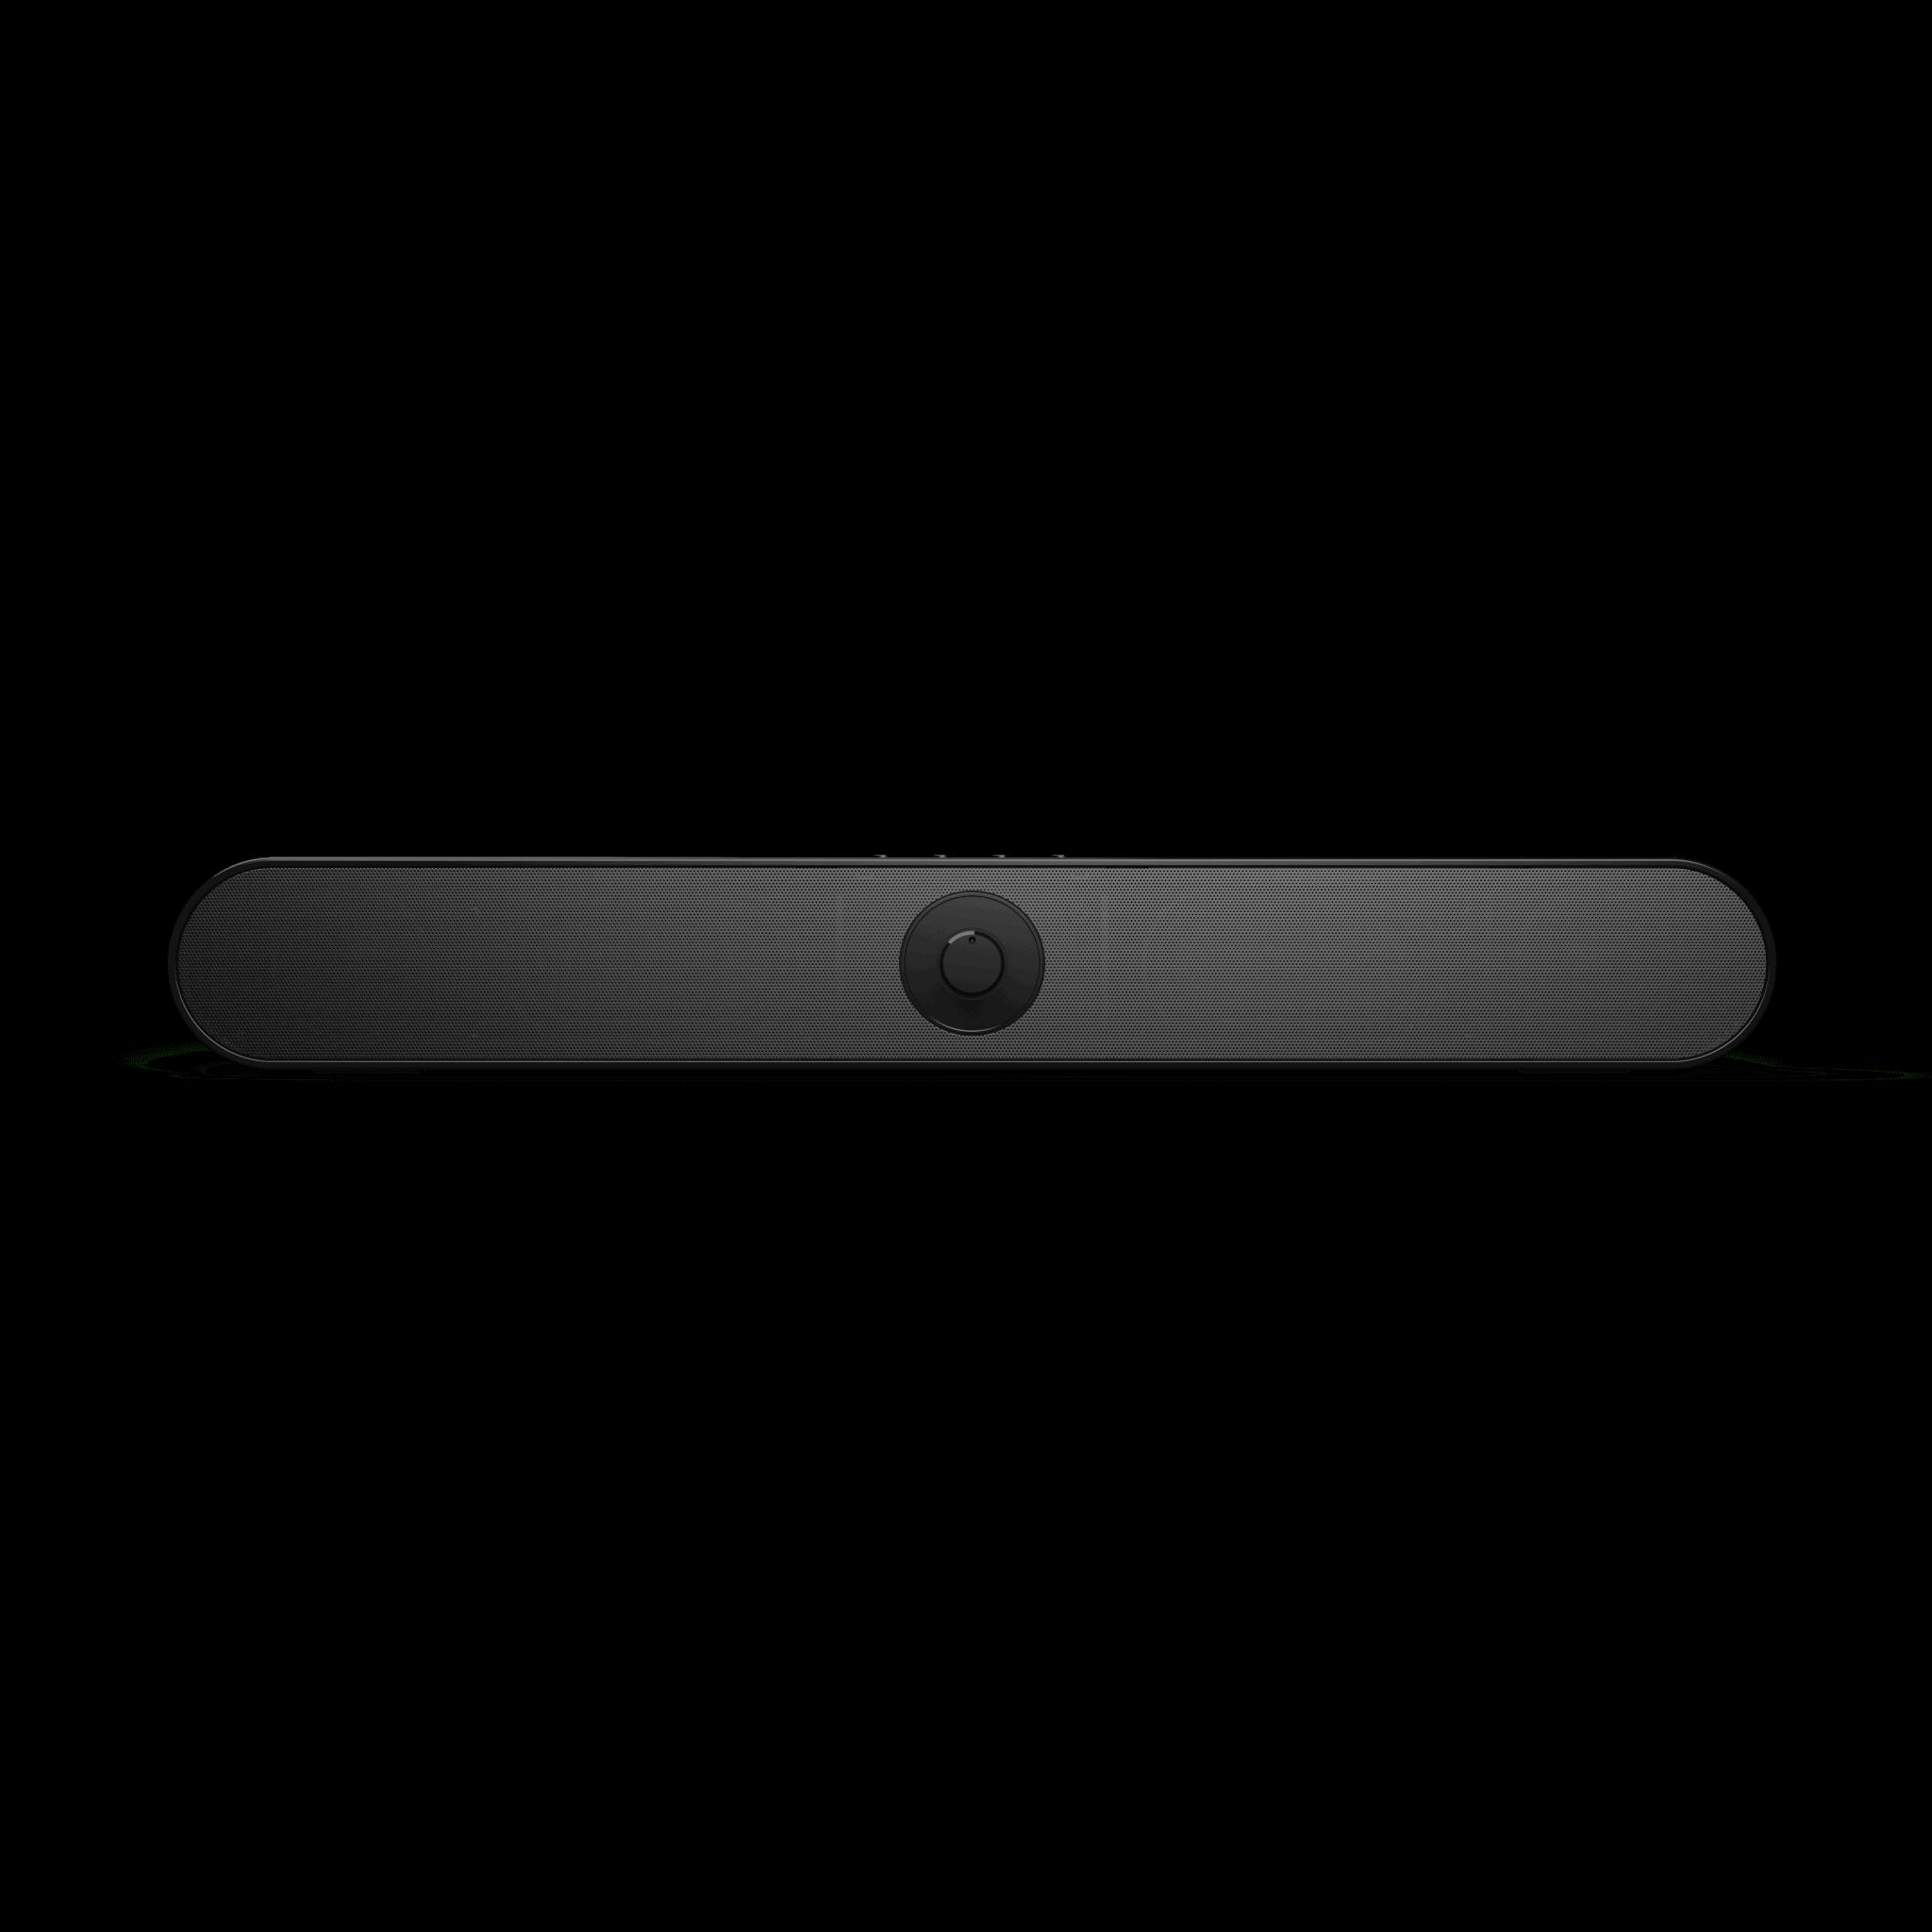 Bluetooth Speakers - Atlas Portable Speaker Front View